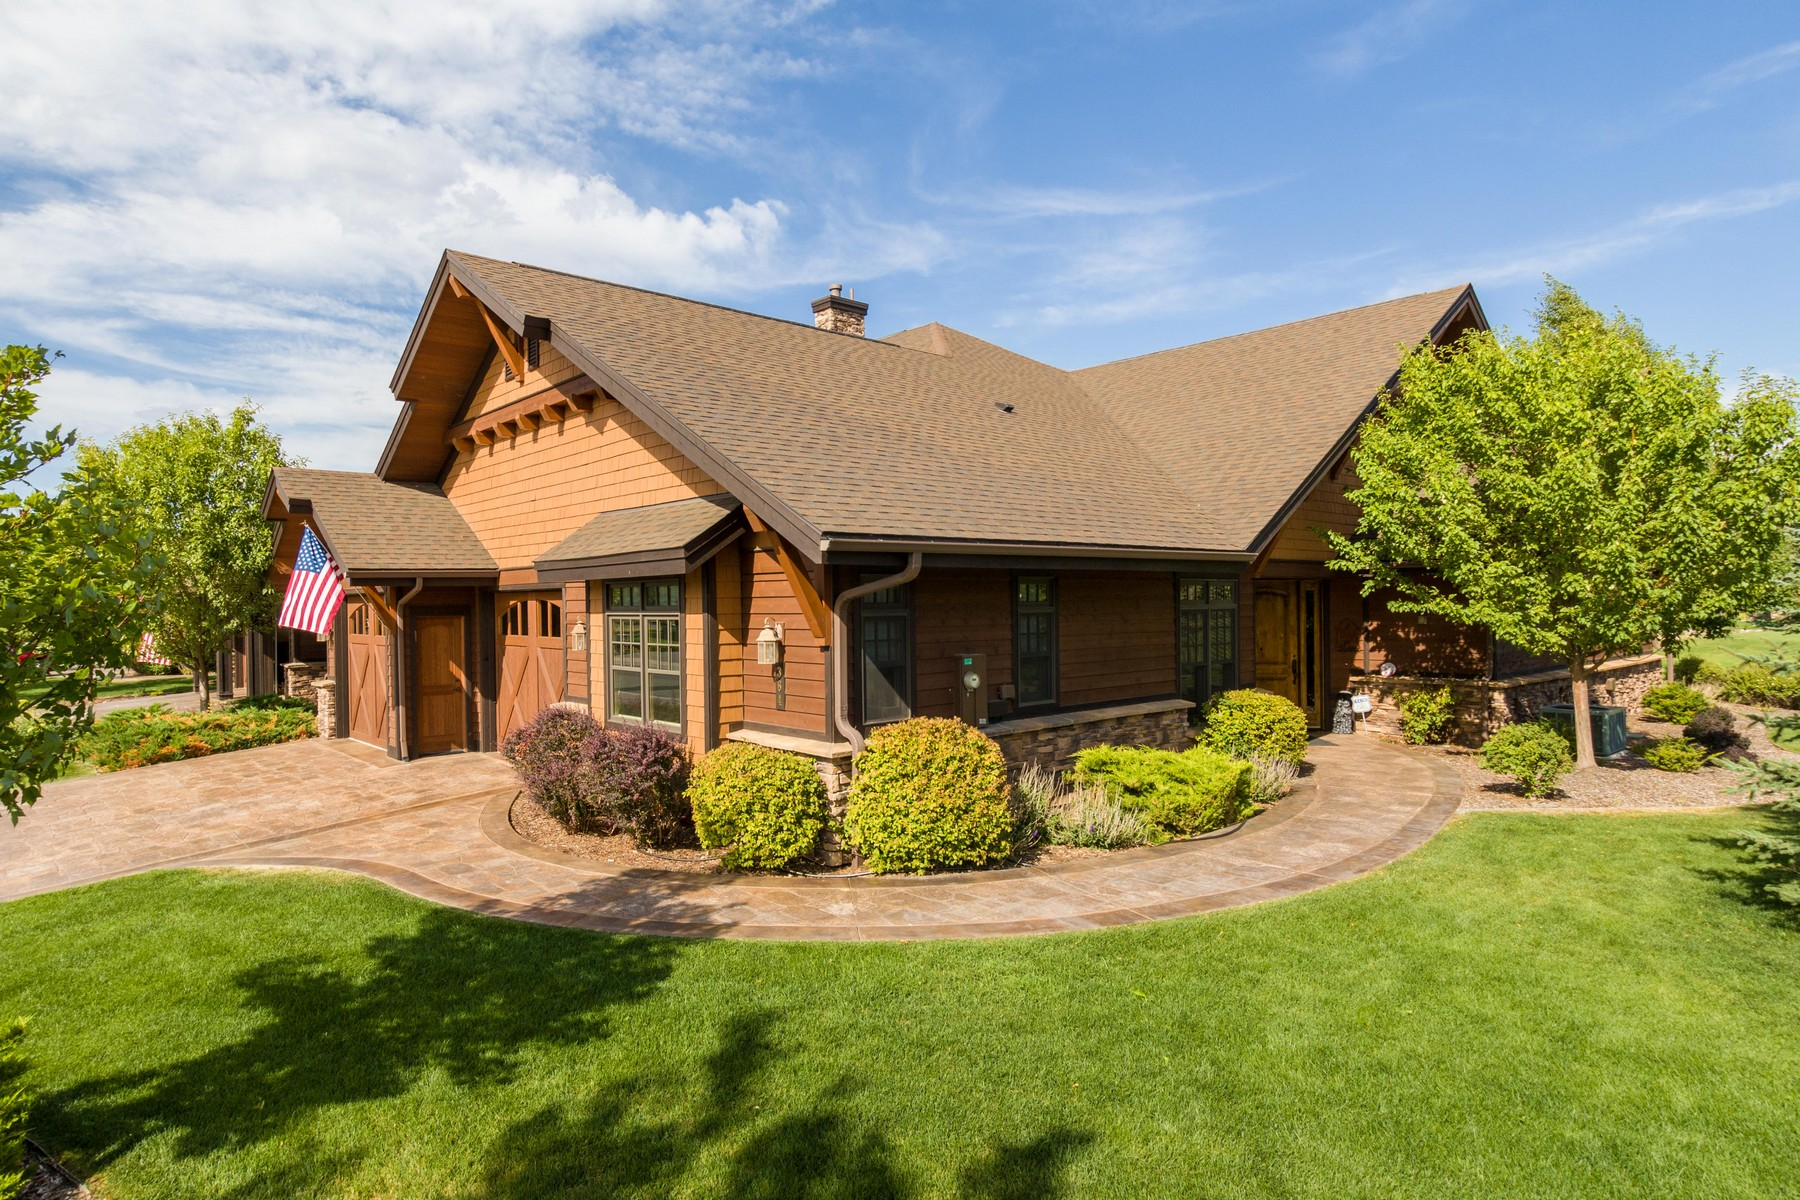 Residência urbana para Venda às Teal @ Harbor Village 364 Eagle Bend Drive Bigfork, Montana 59911 Estados Unidos